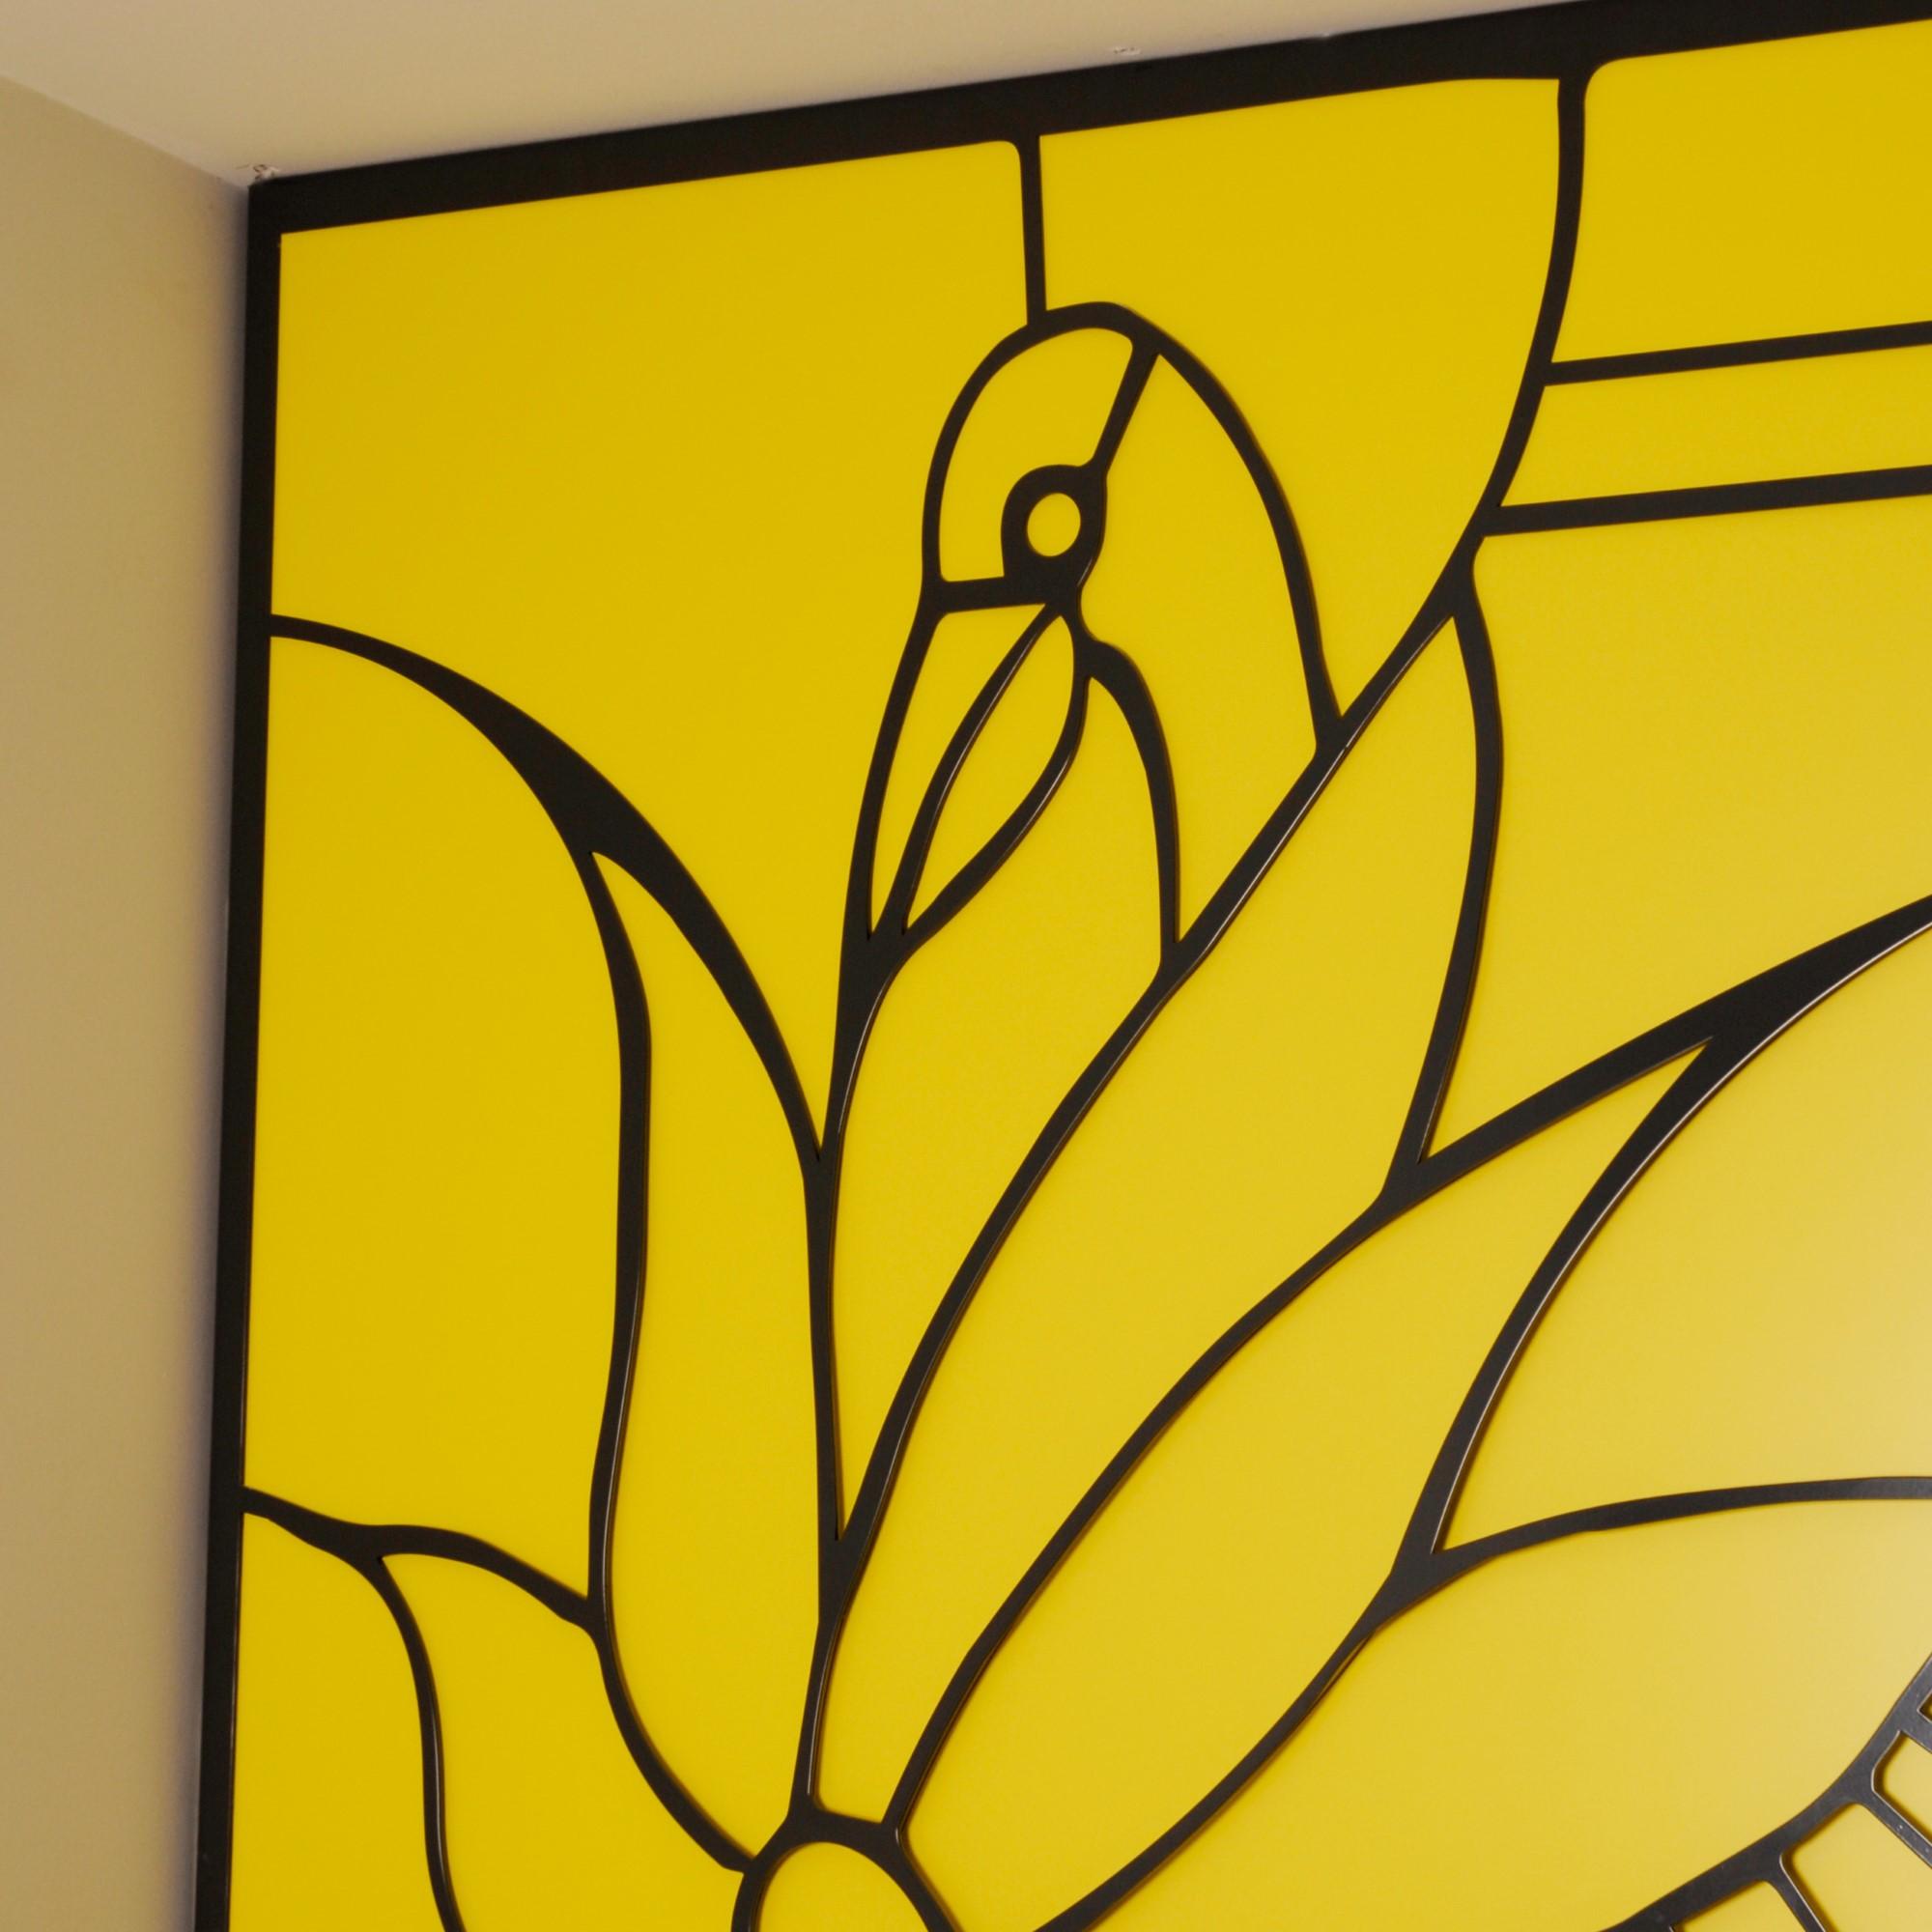 Birdman Dekoratif Seperatör